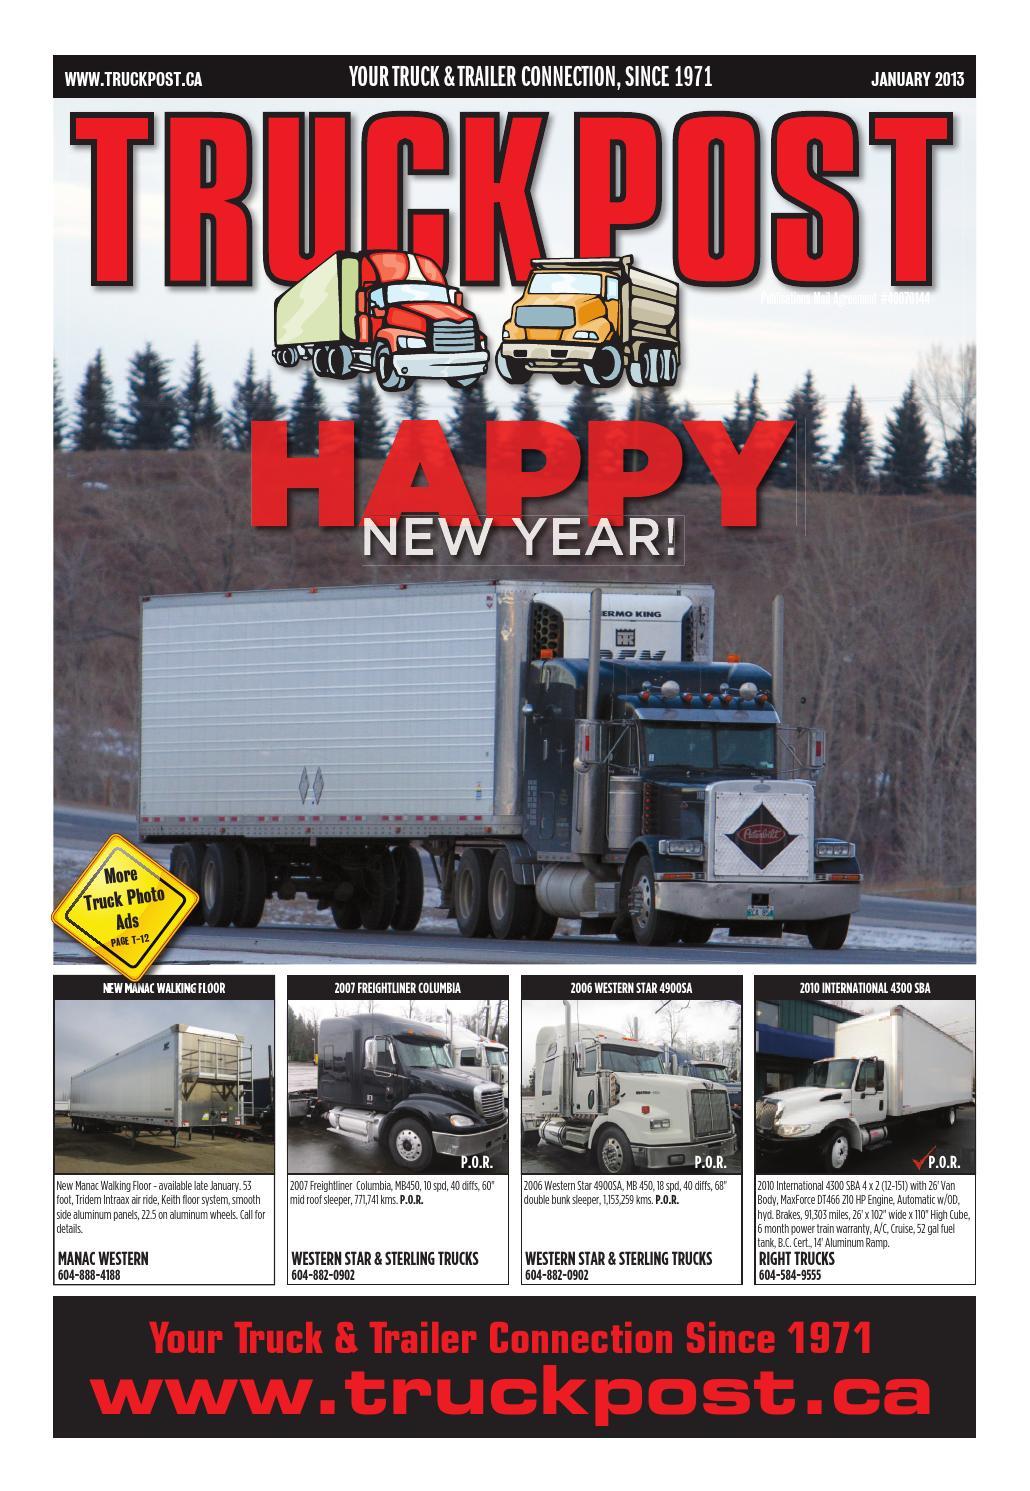 Truck Post Jan 2013 By Supply Newspaper Issuu Crane Ignition Wiring Diagram T300 Kenworth